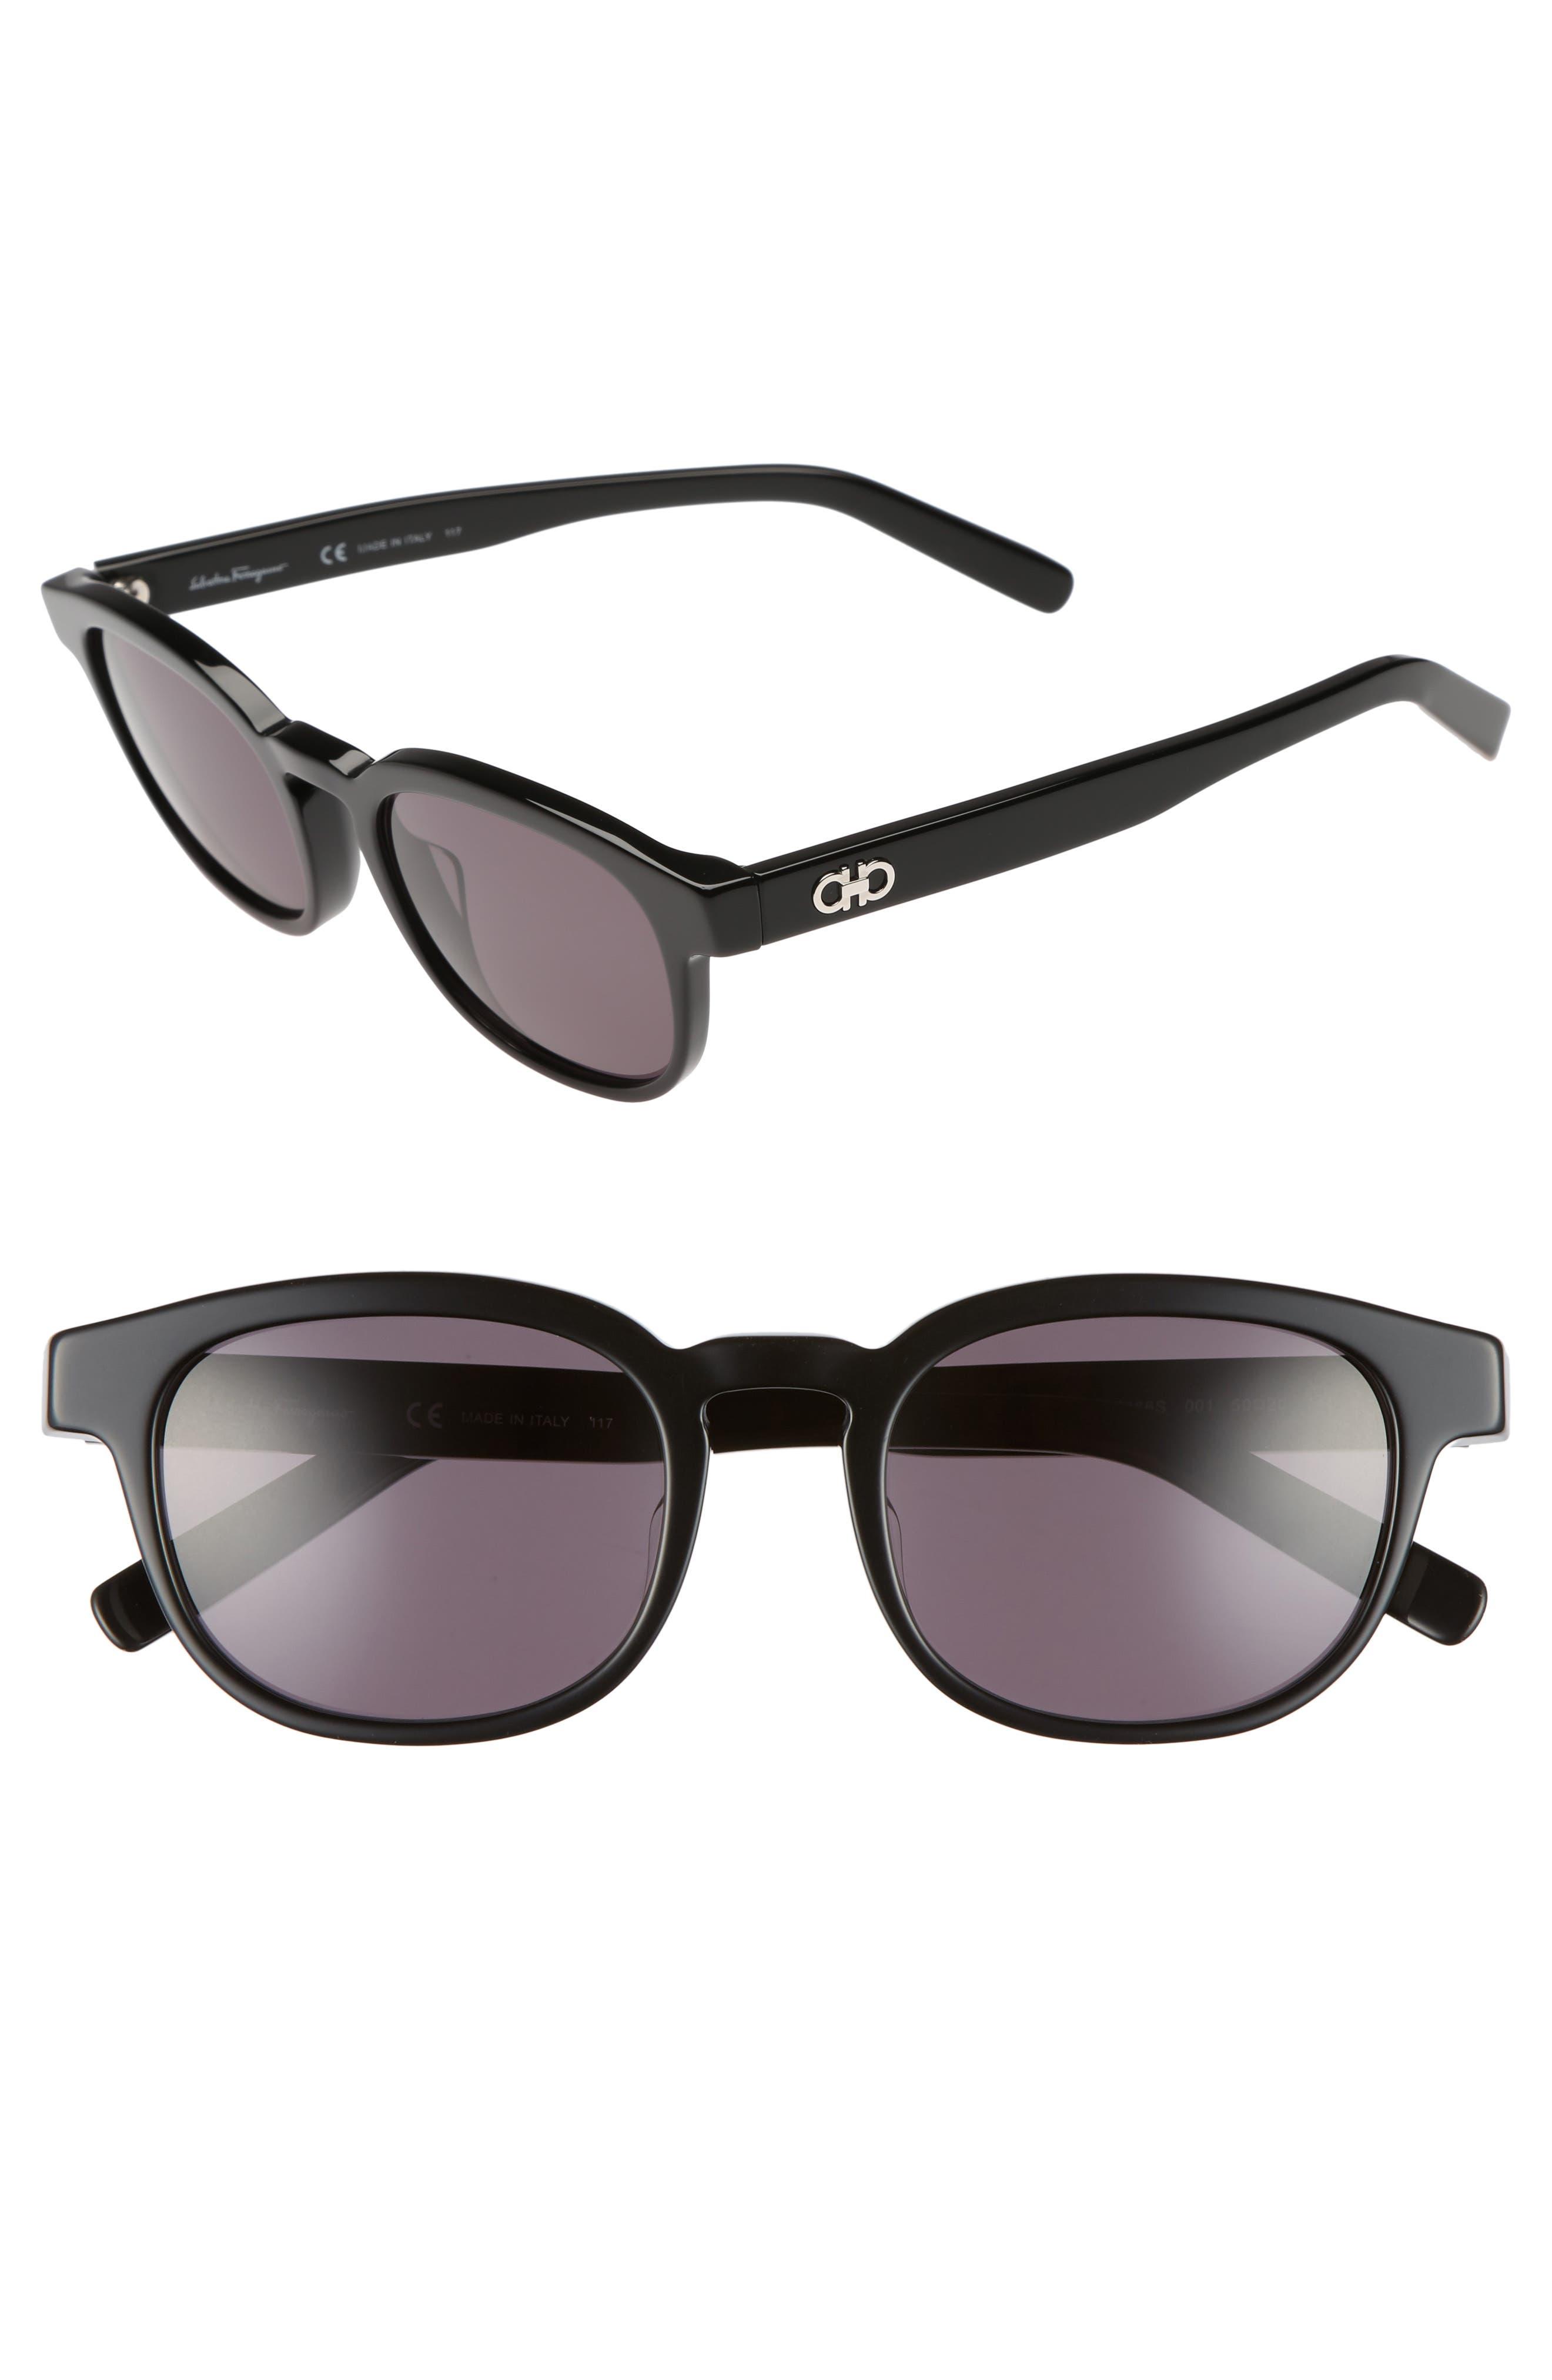 866S 50mm Sunglasses,                             Main thumbnail 1, color,                             BLACK